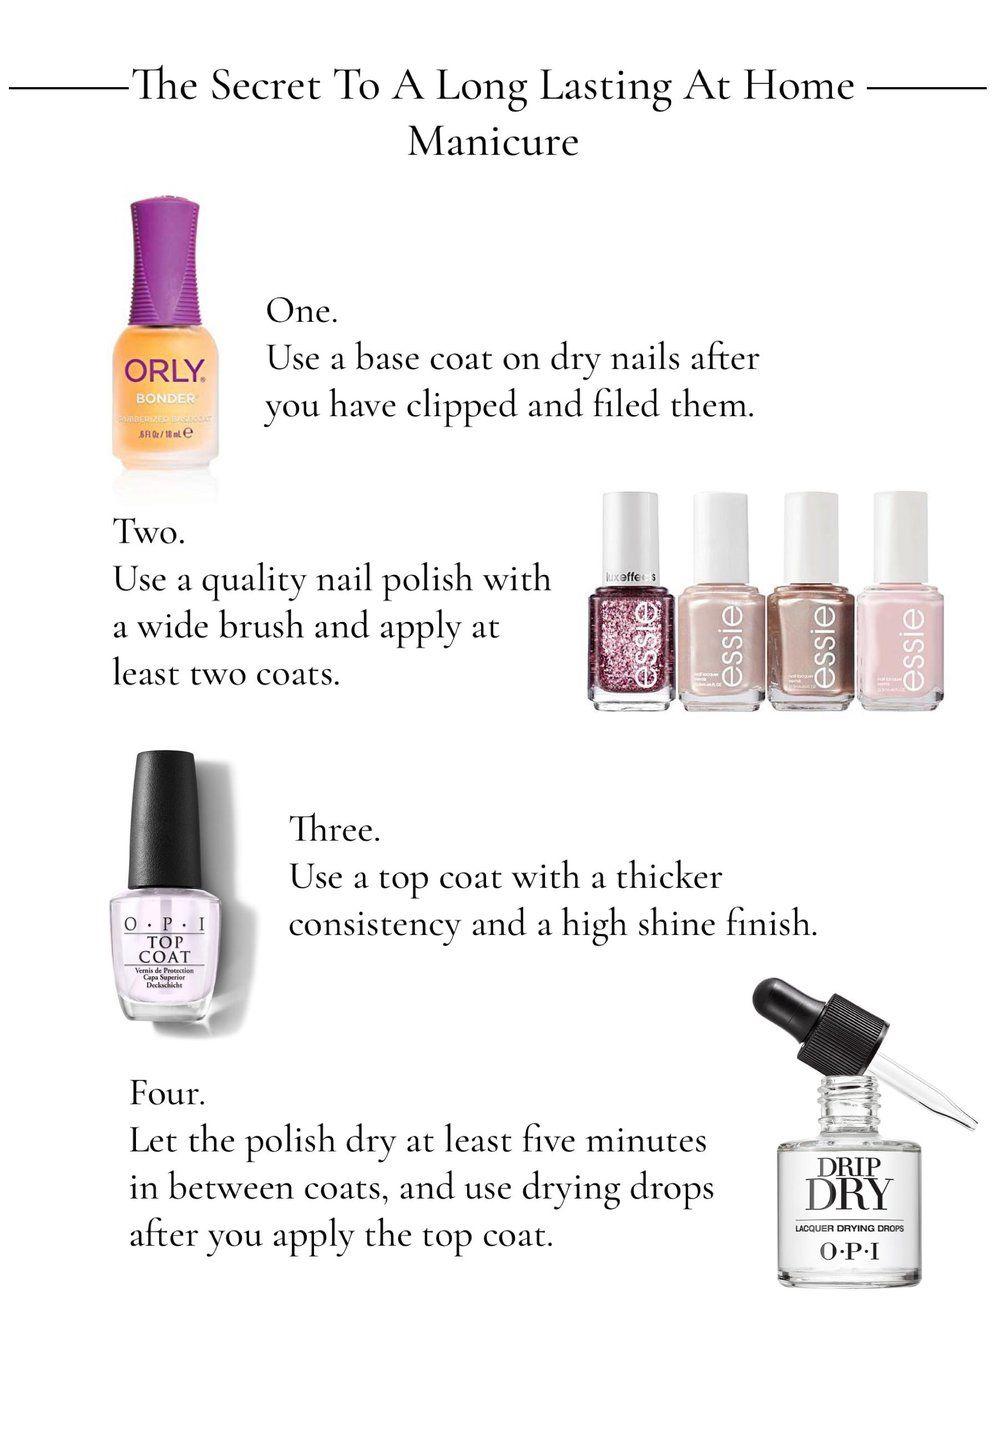 How Long Between Nail Polish Coats : between, polish, coats, Secret, Lasting, Manicure, Glitters, Home,, Tutorials,, Essie, Manicures